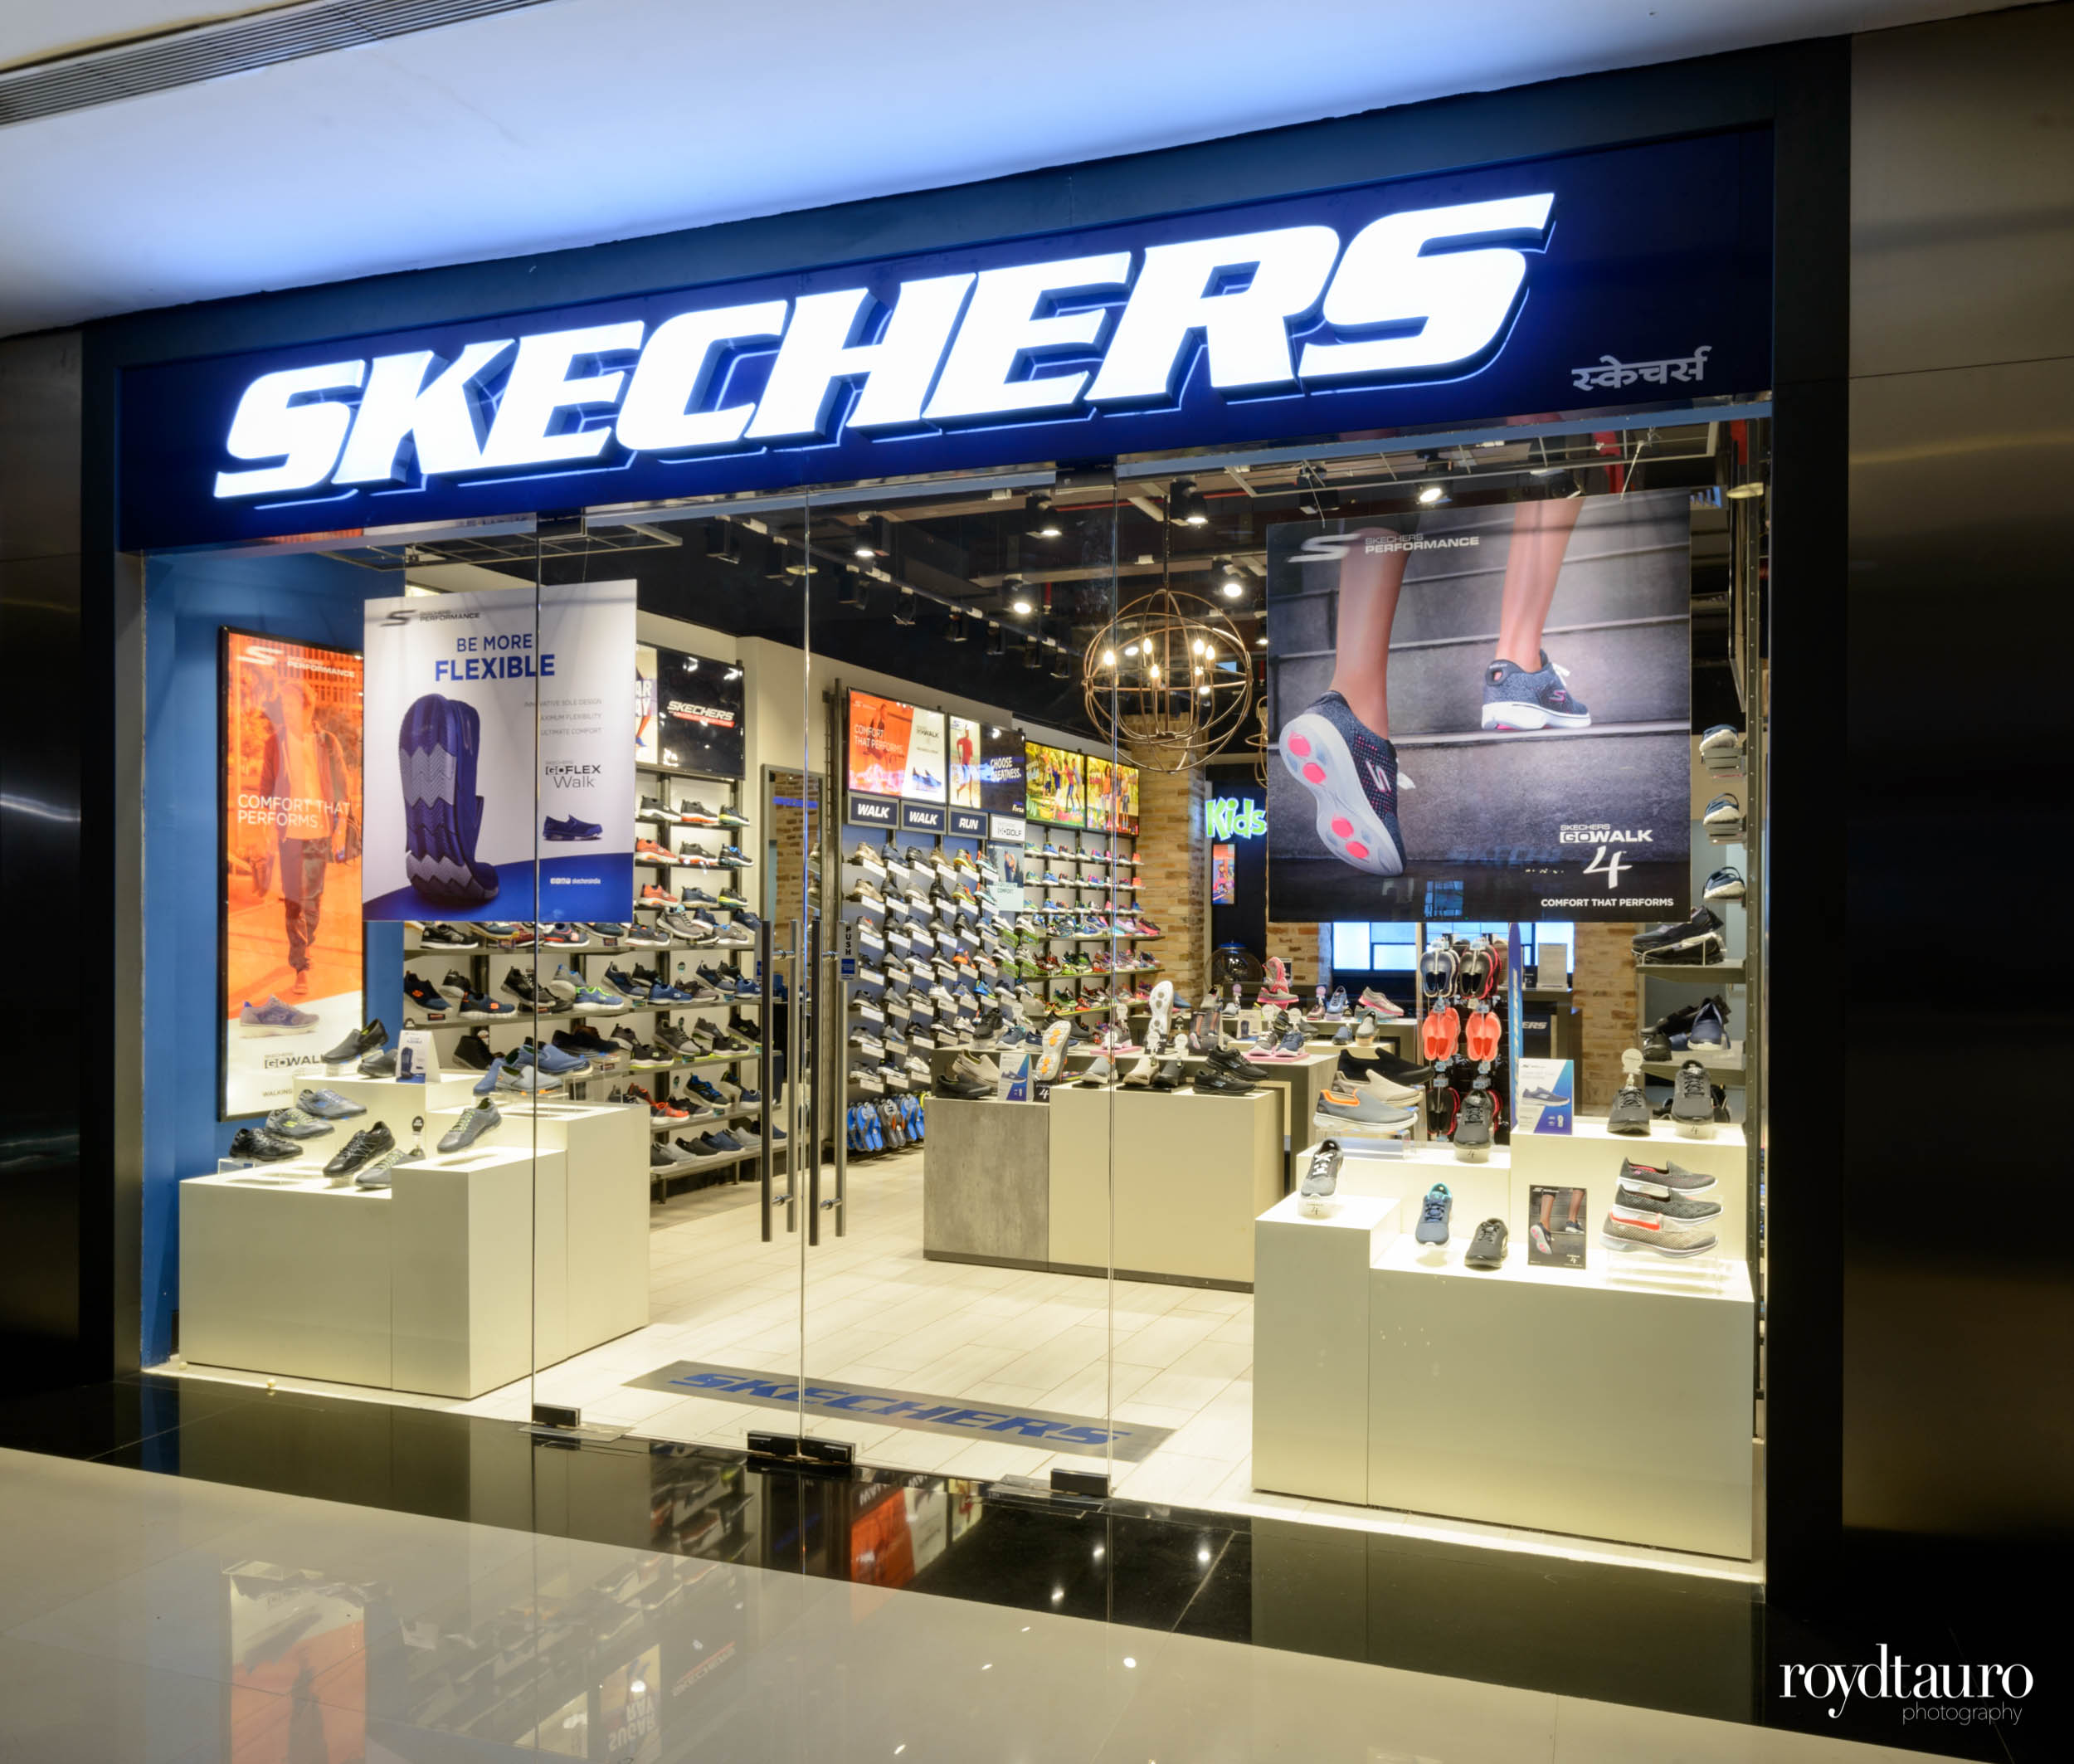 Skechers-2.jpg